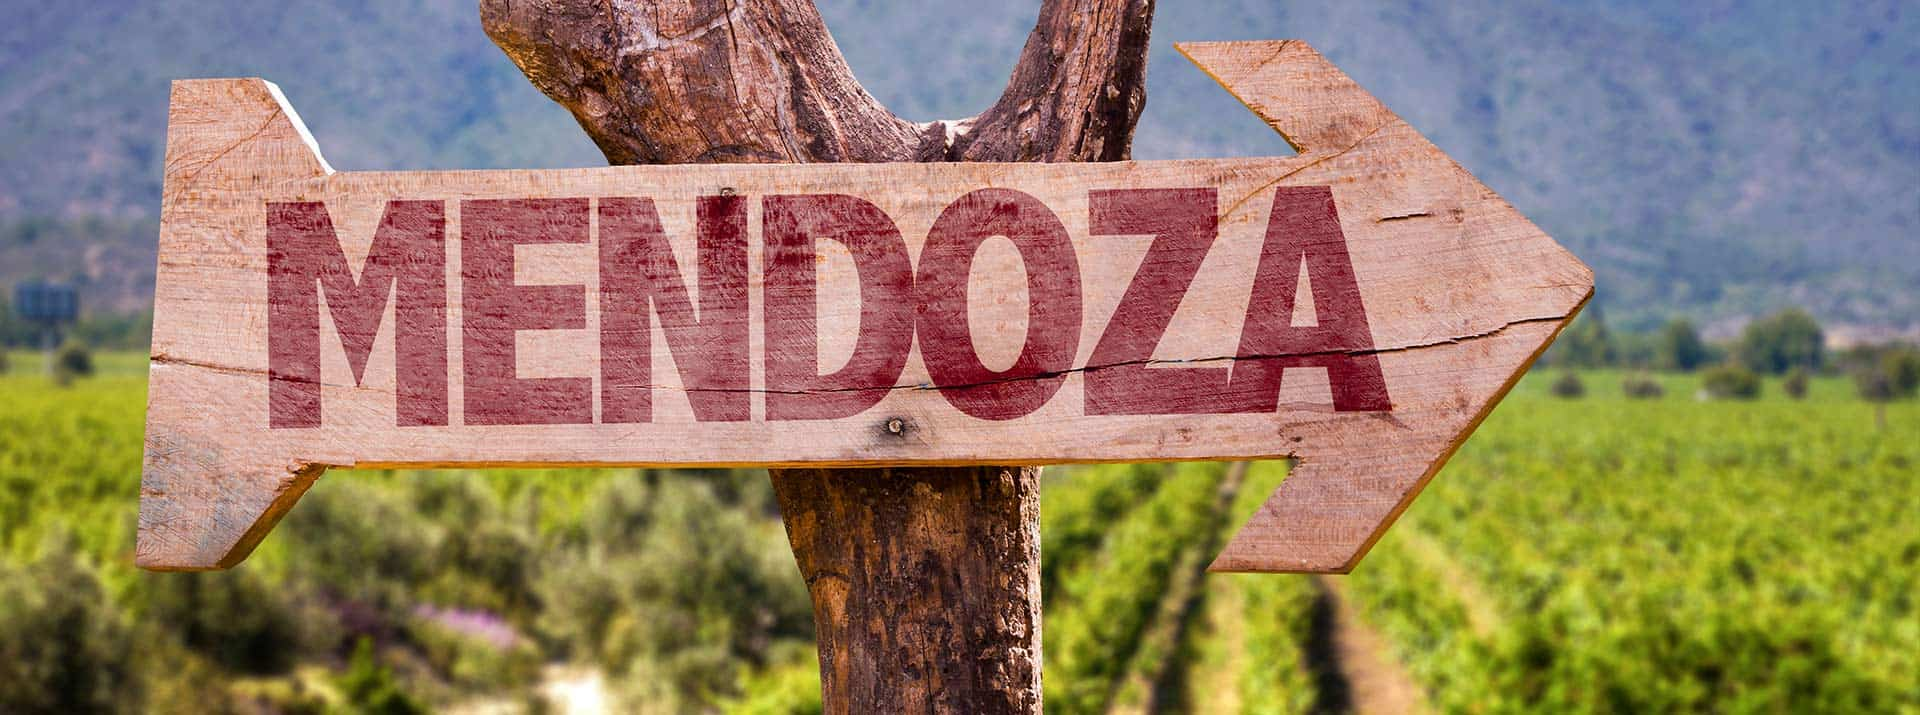 Weinkellerei Meraner Perdriel Mendoza